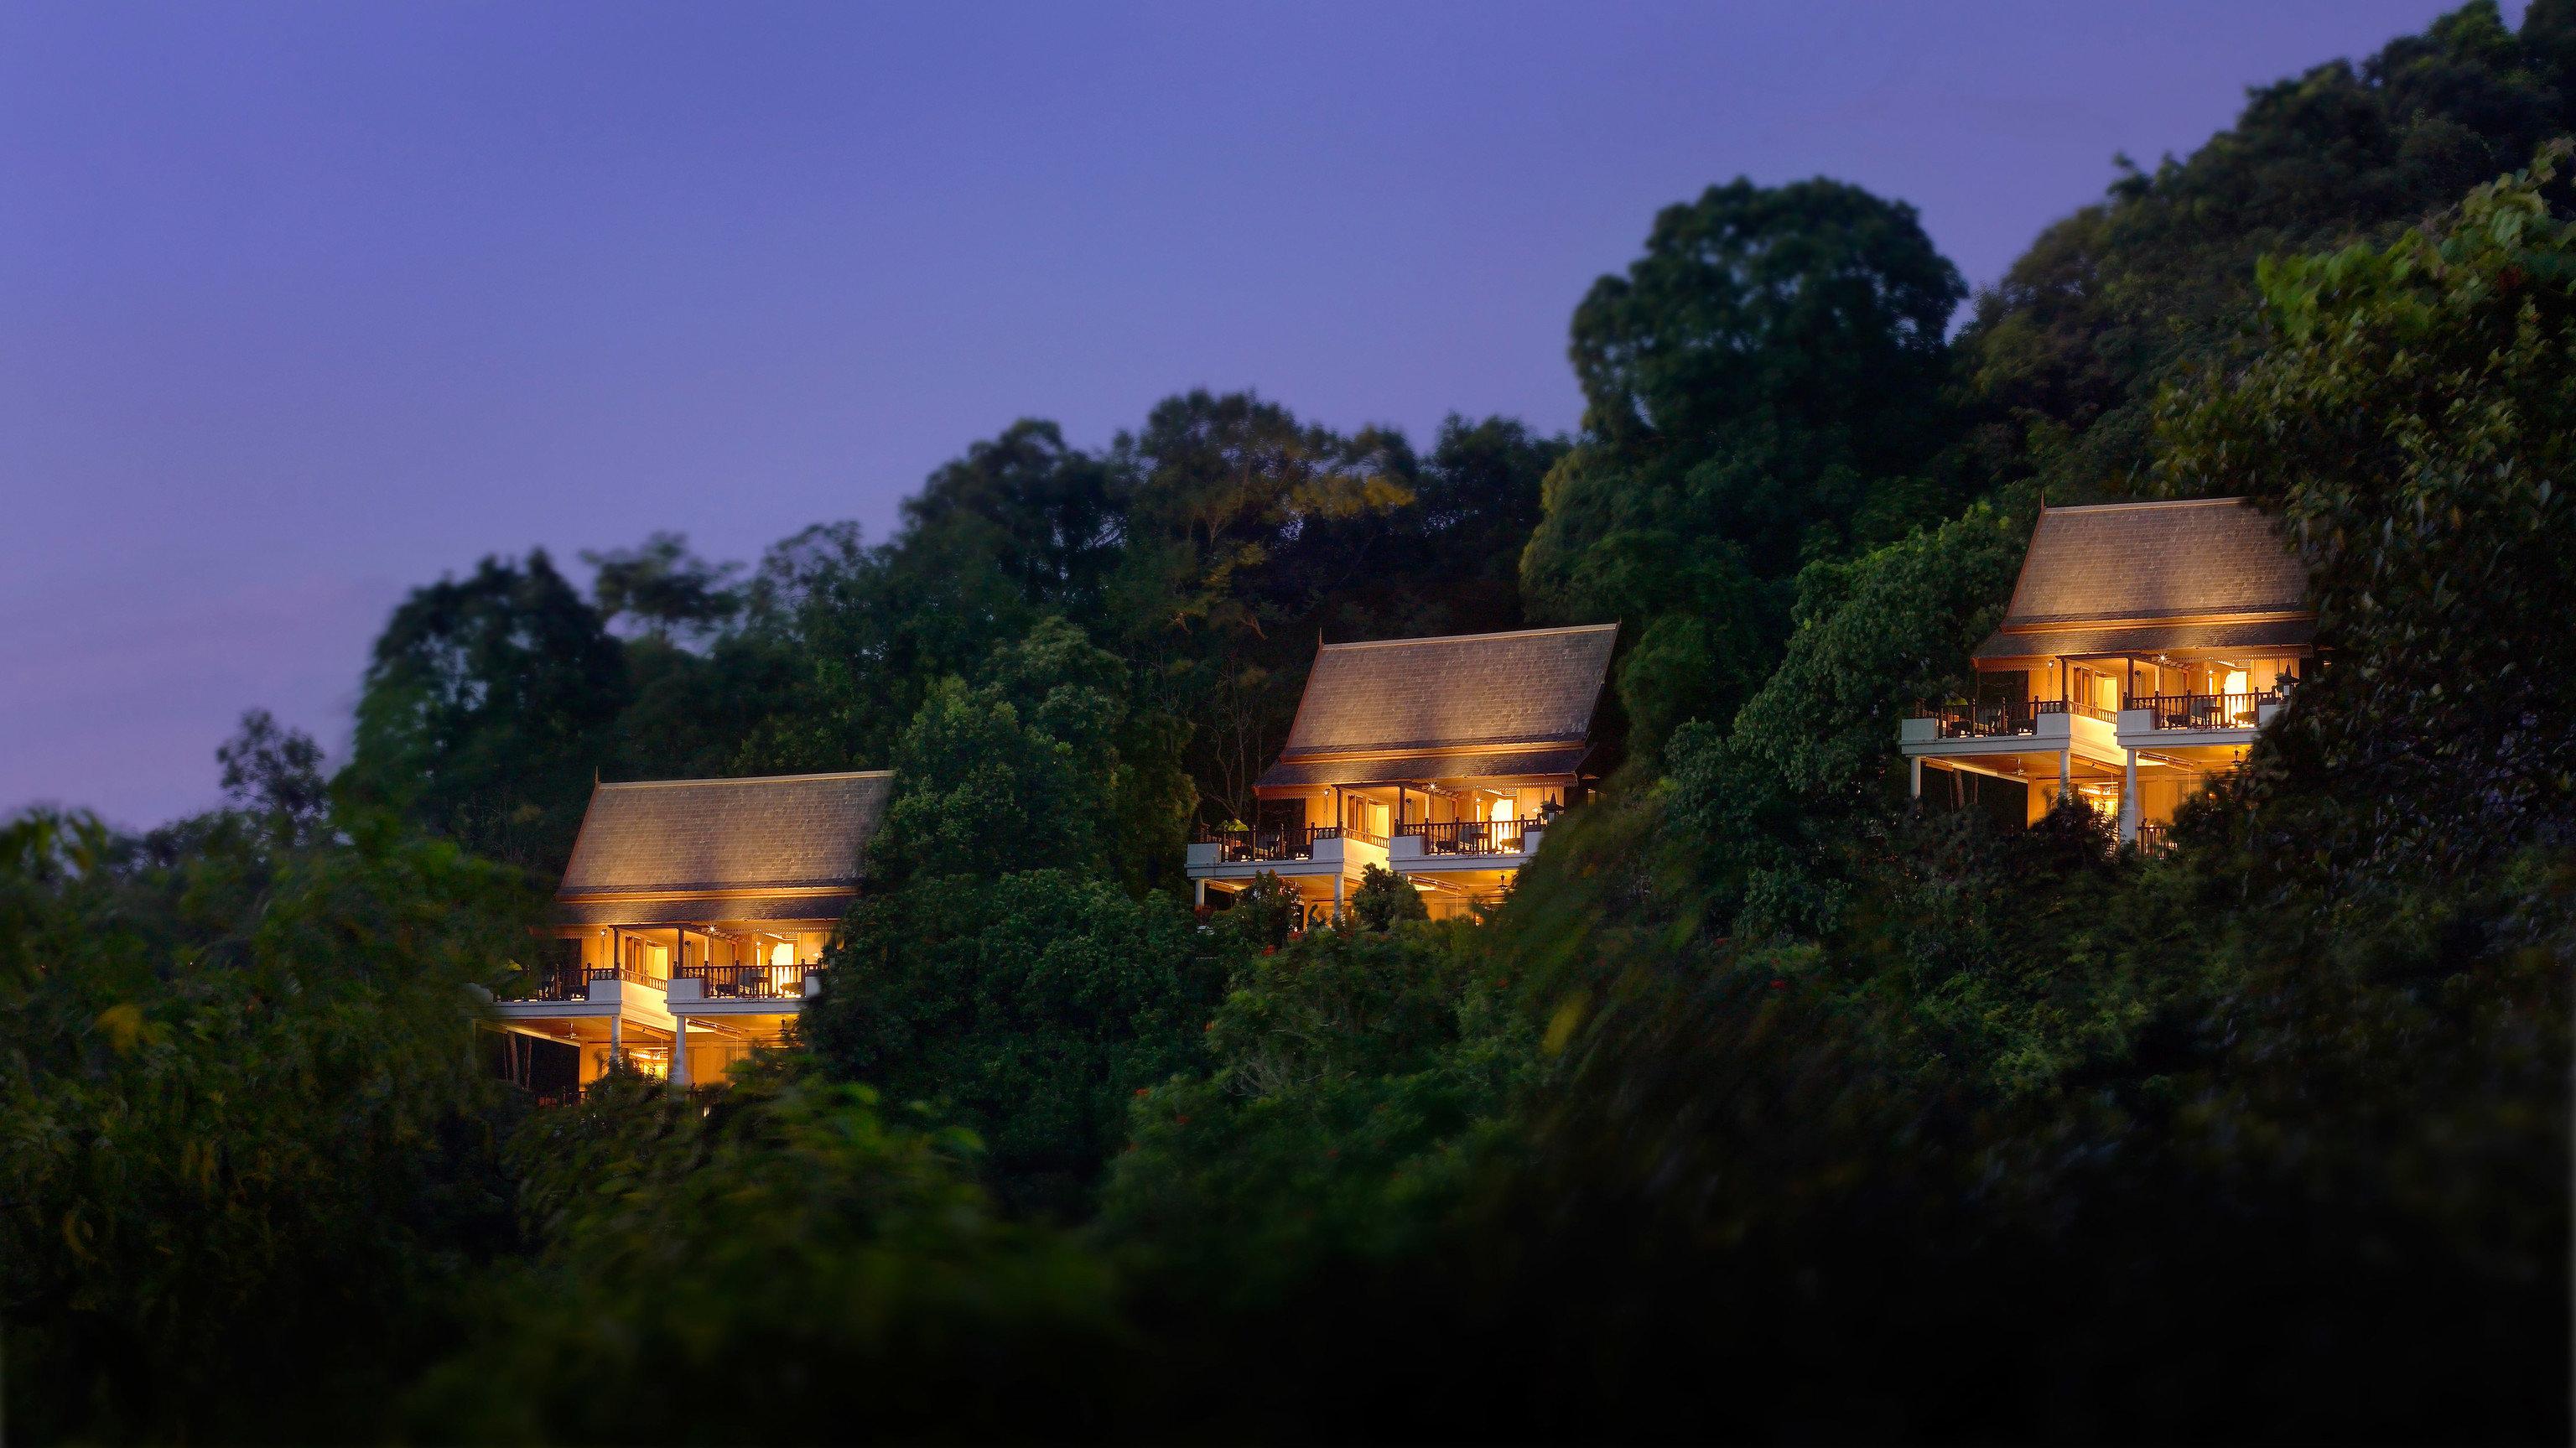 Hotels tree outdoor house yellow night light lighting screenshot